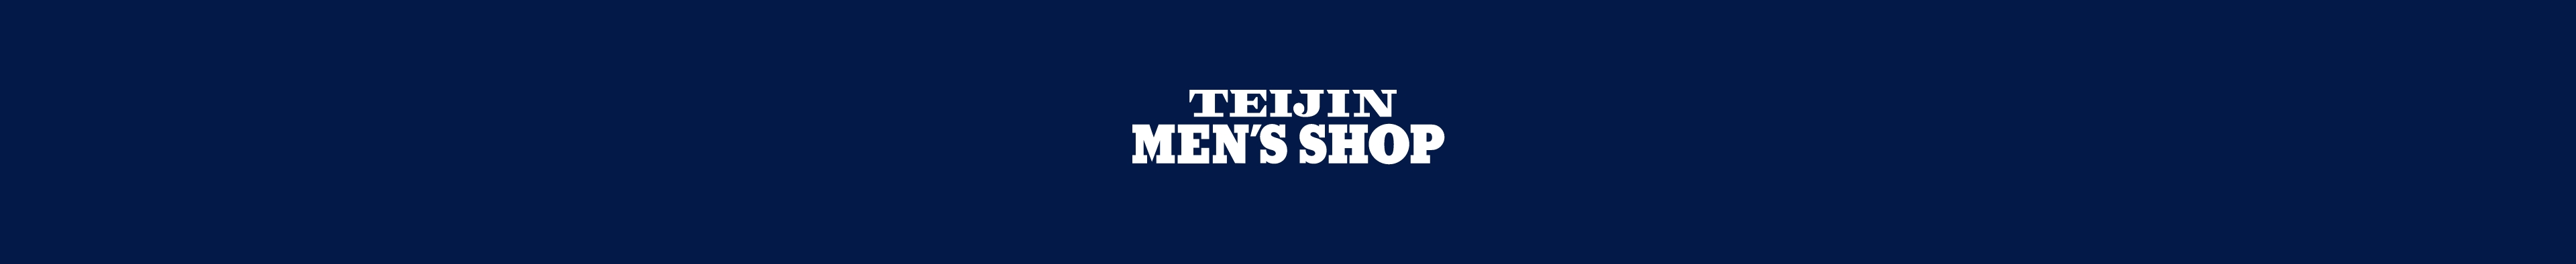 TEIJIN MEN'S SHOP